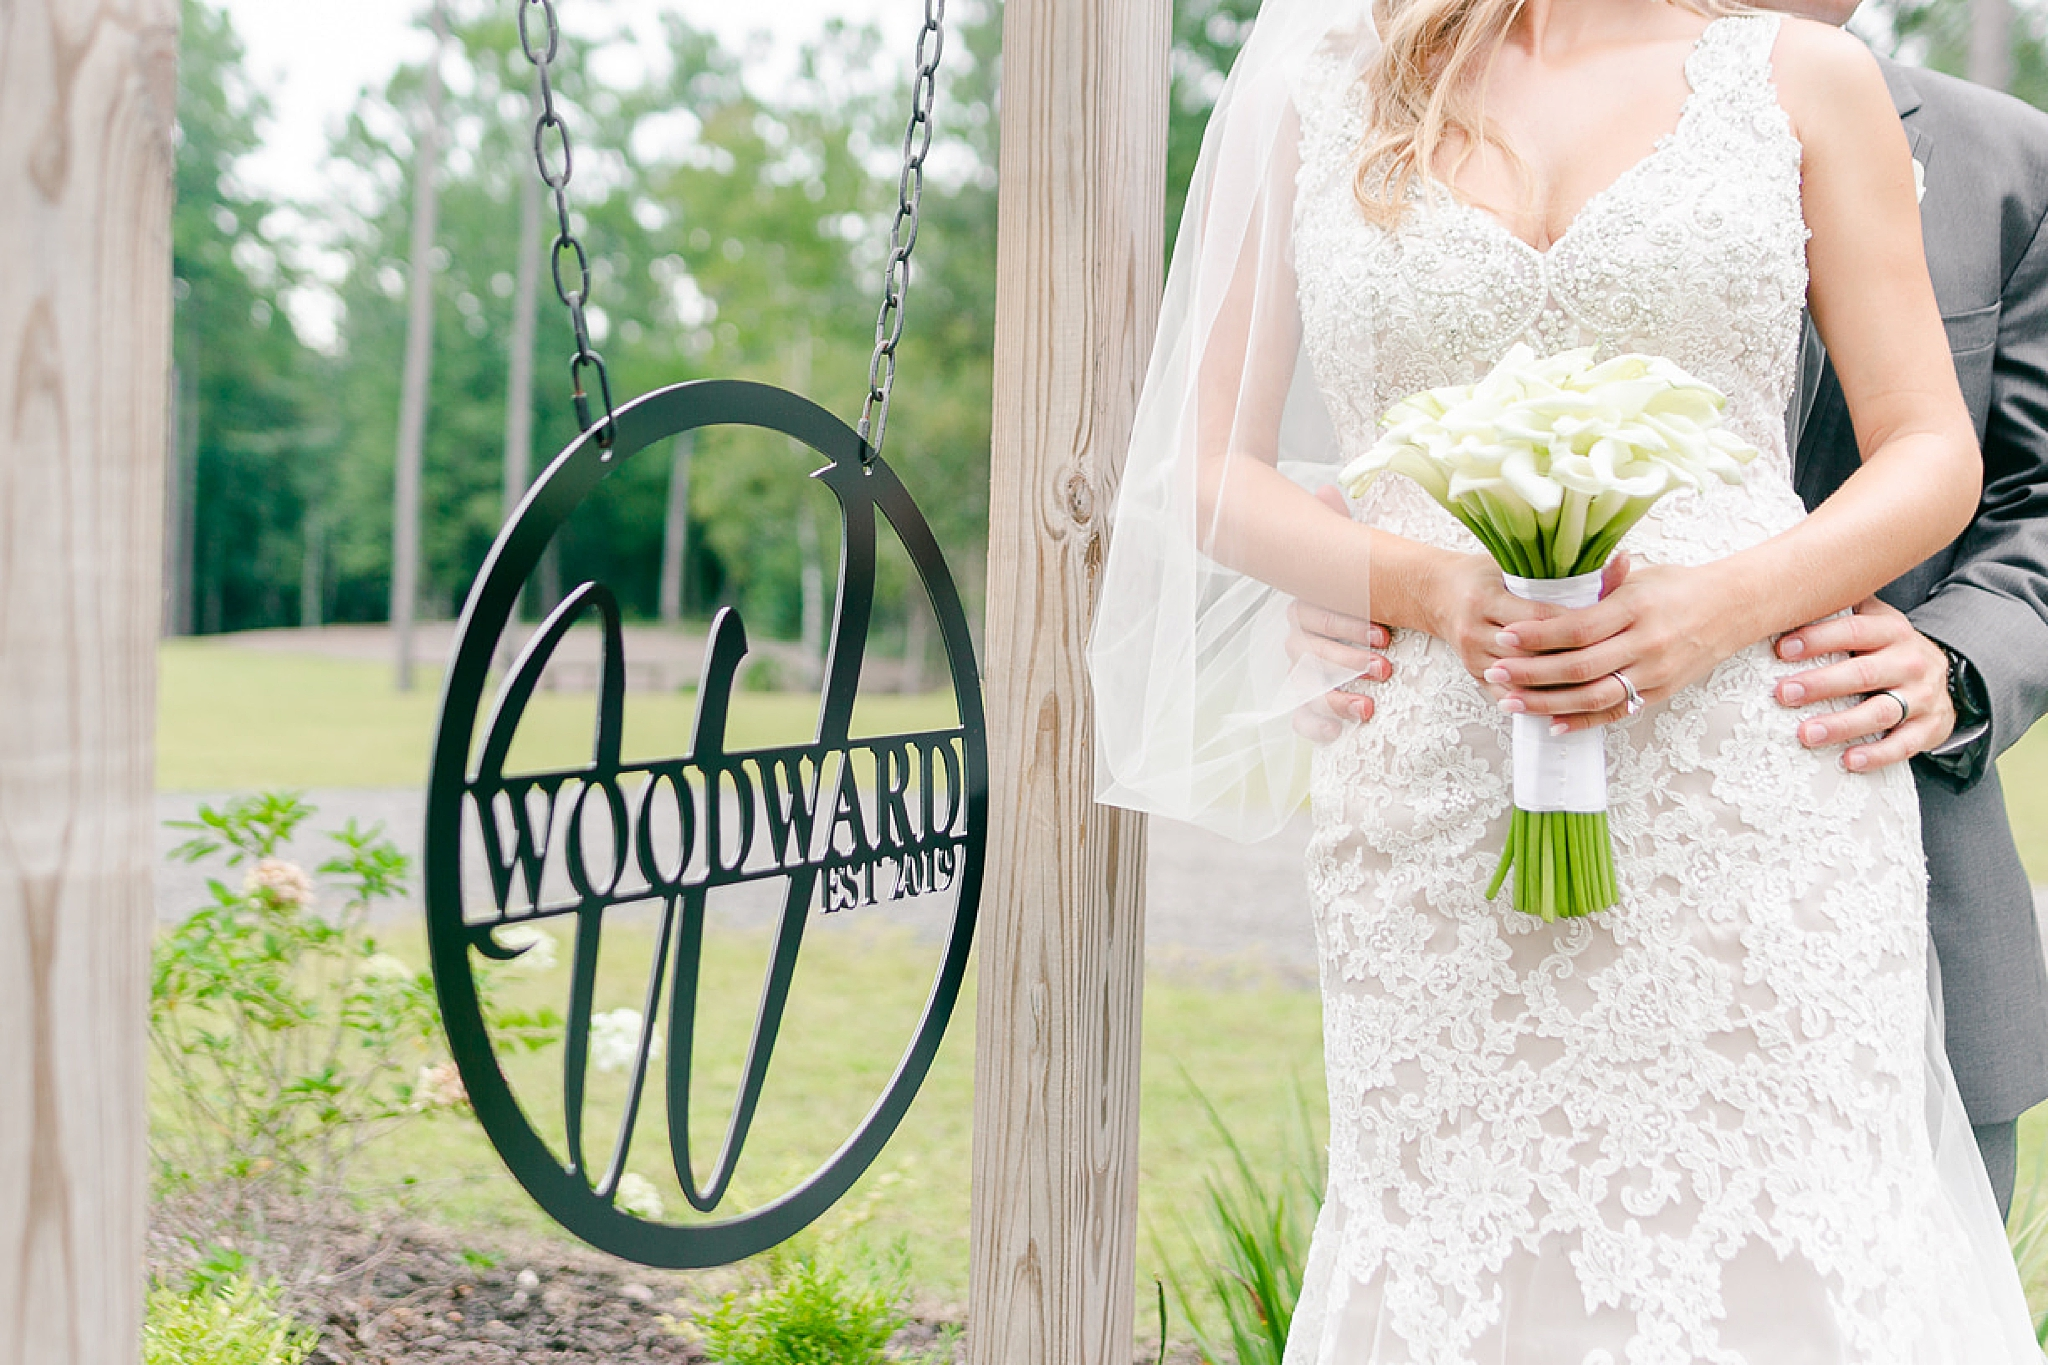 couple poses by custom sign on Izenstone wedding day